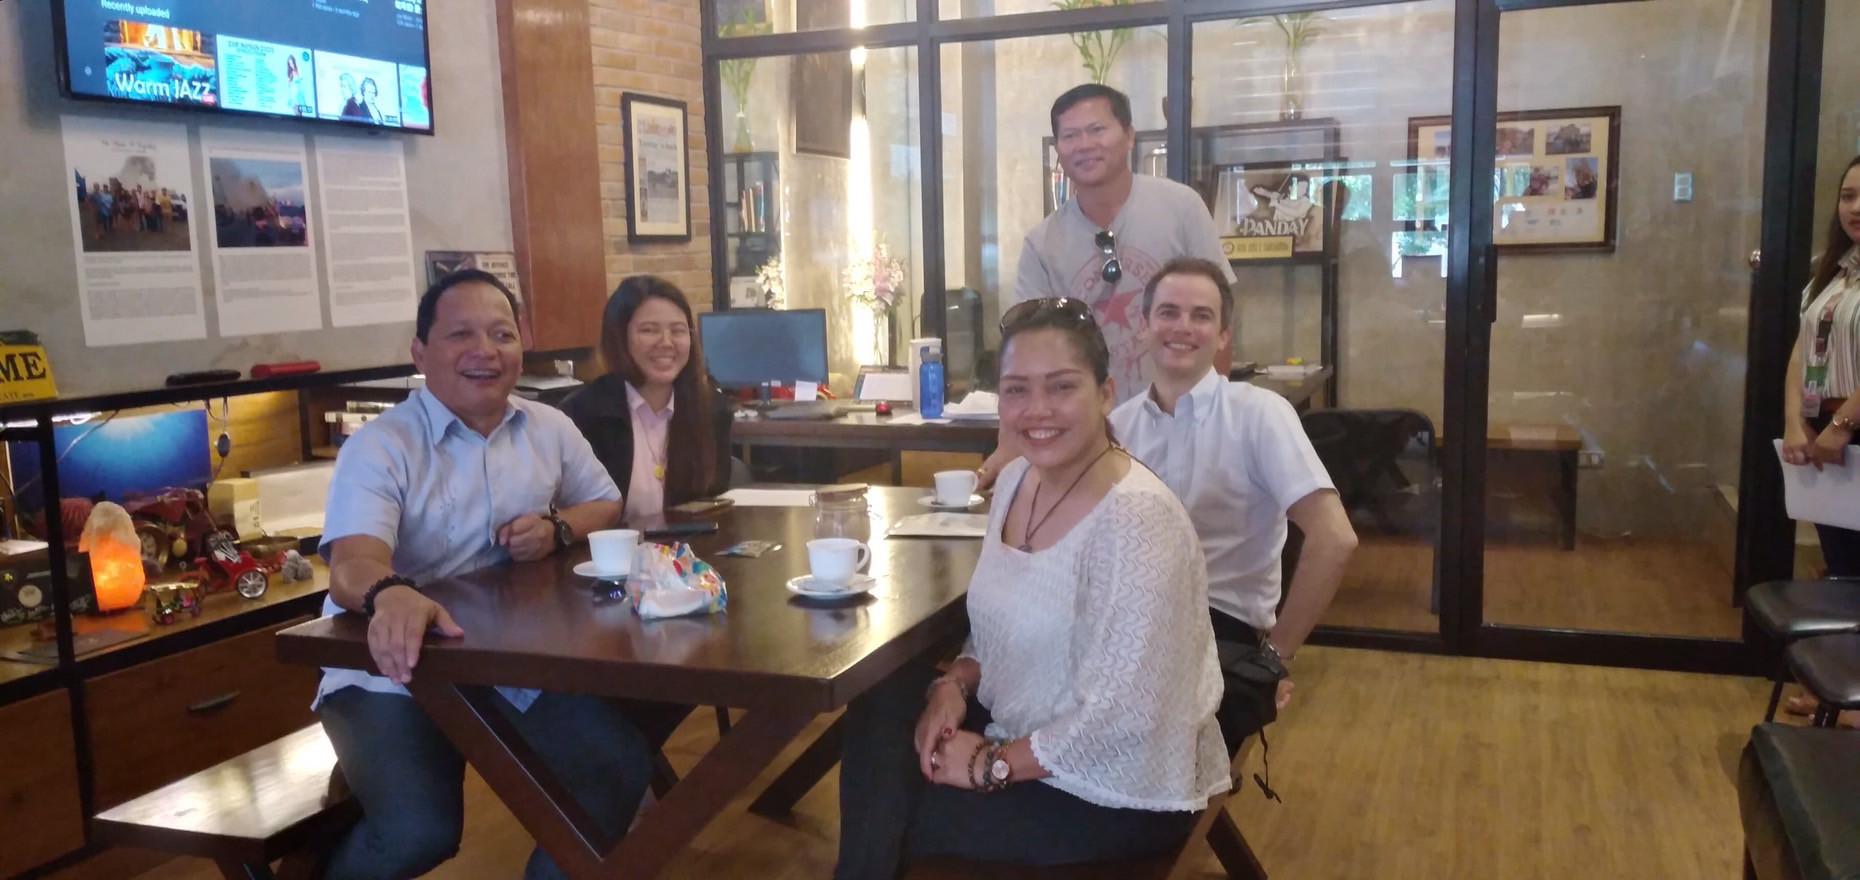 Meeting with Cebu City Councilor Joel Garganera at Cebu City Hall